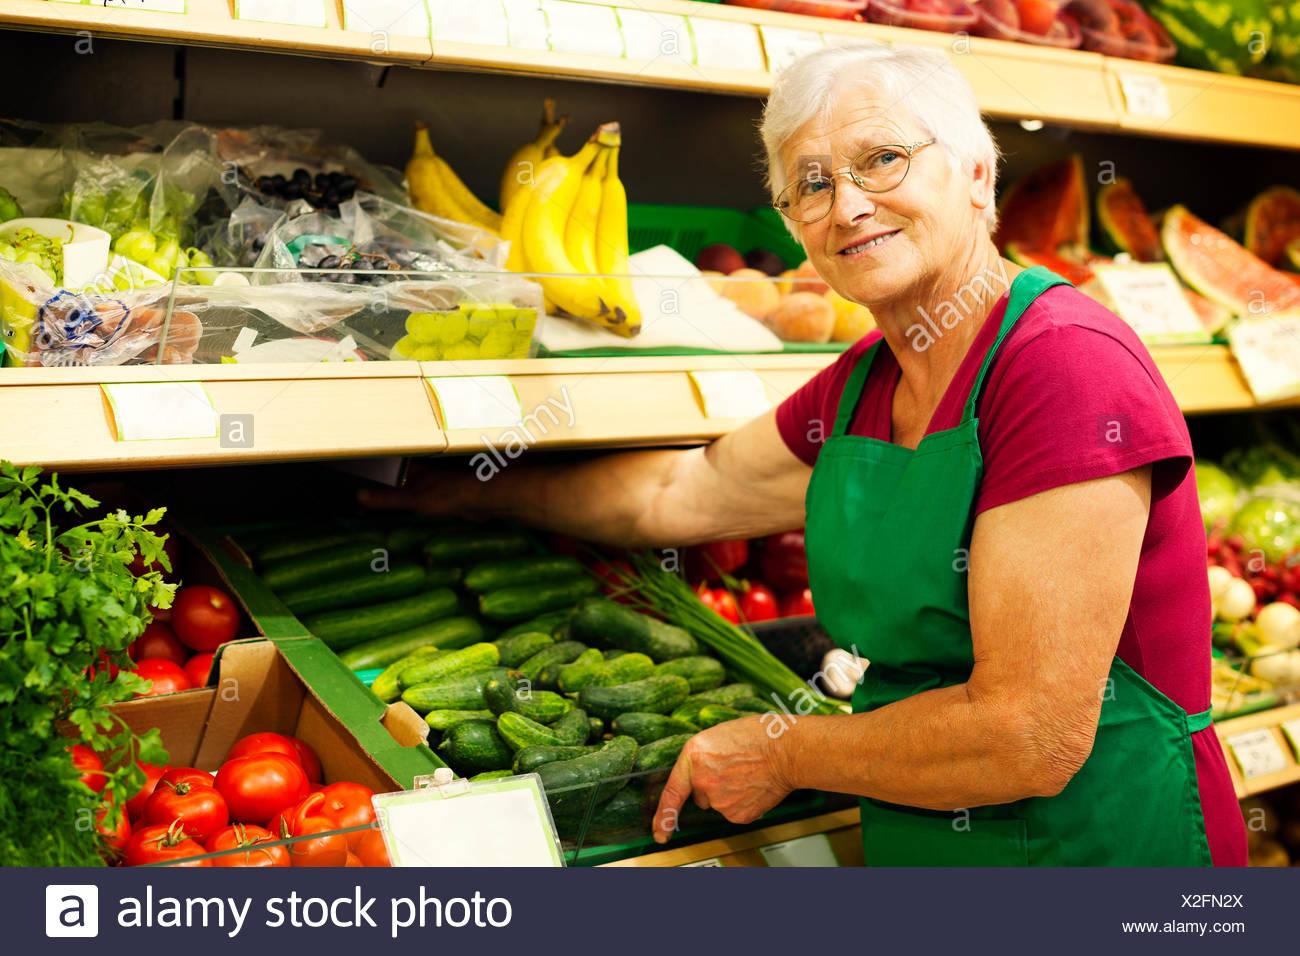 Senior woman arranging vegetables on shelf Debica, Poland - Stock Image